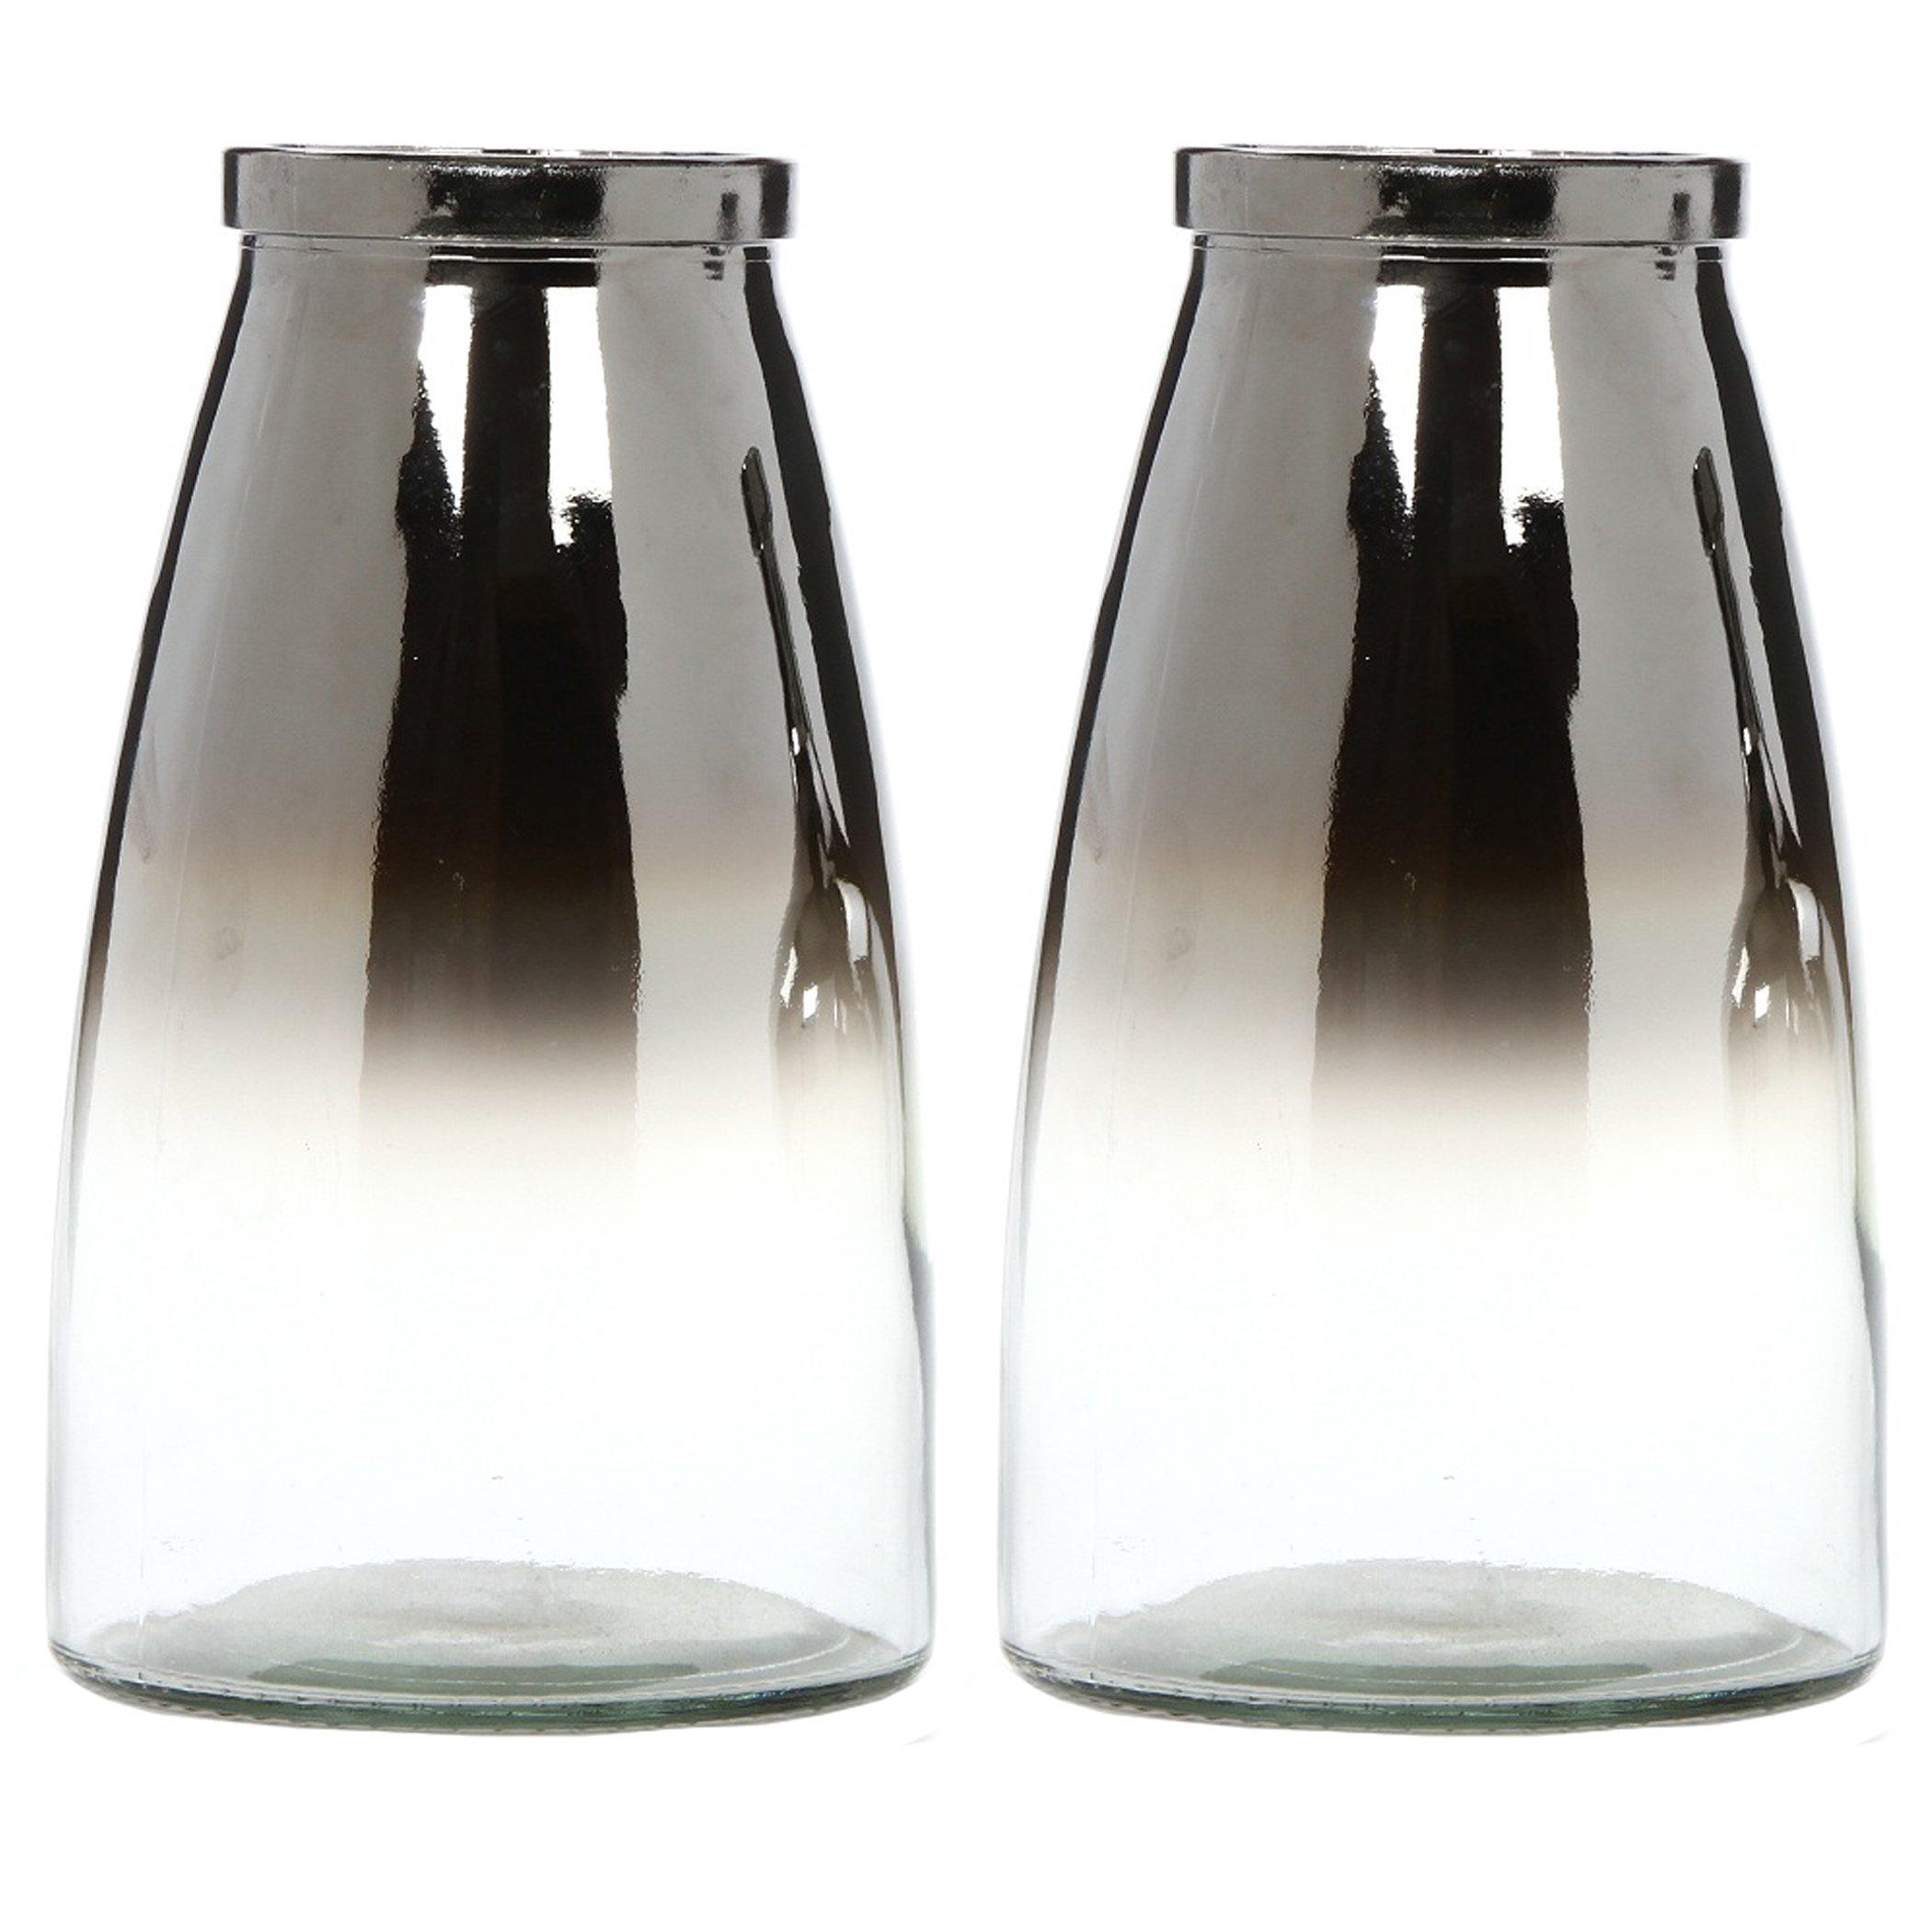 Hosley's Set of 2, Silver Glass Flower Vase - 10.25'' High. Ideal Gift for Weddings, Bridal, Spa, Meditation, Reiki, Rose Vase, Nautical Settings, Storage P1